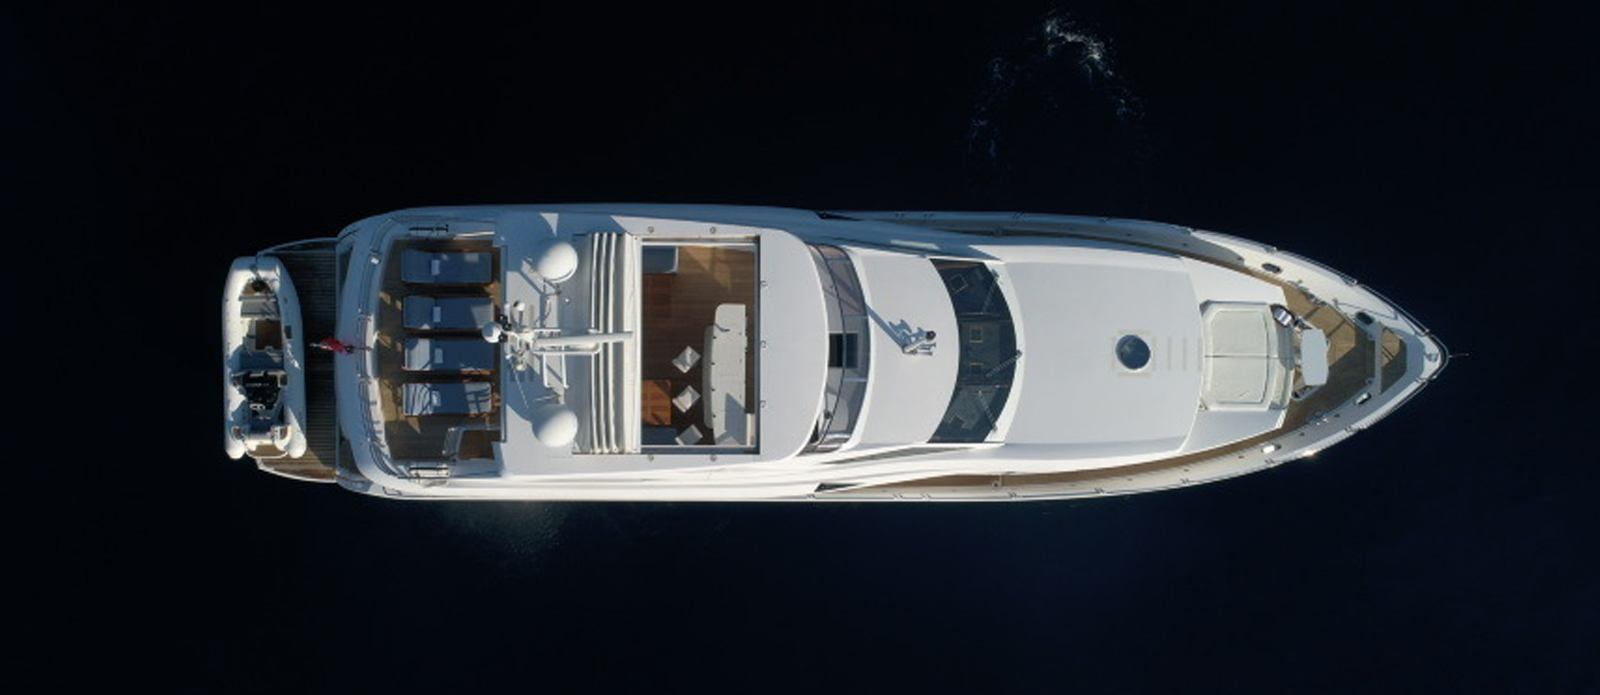 Sunseeker-30-Metre-Yacht-Tuppence---Overhead-2